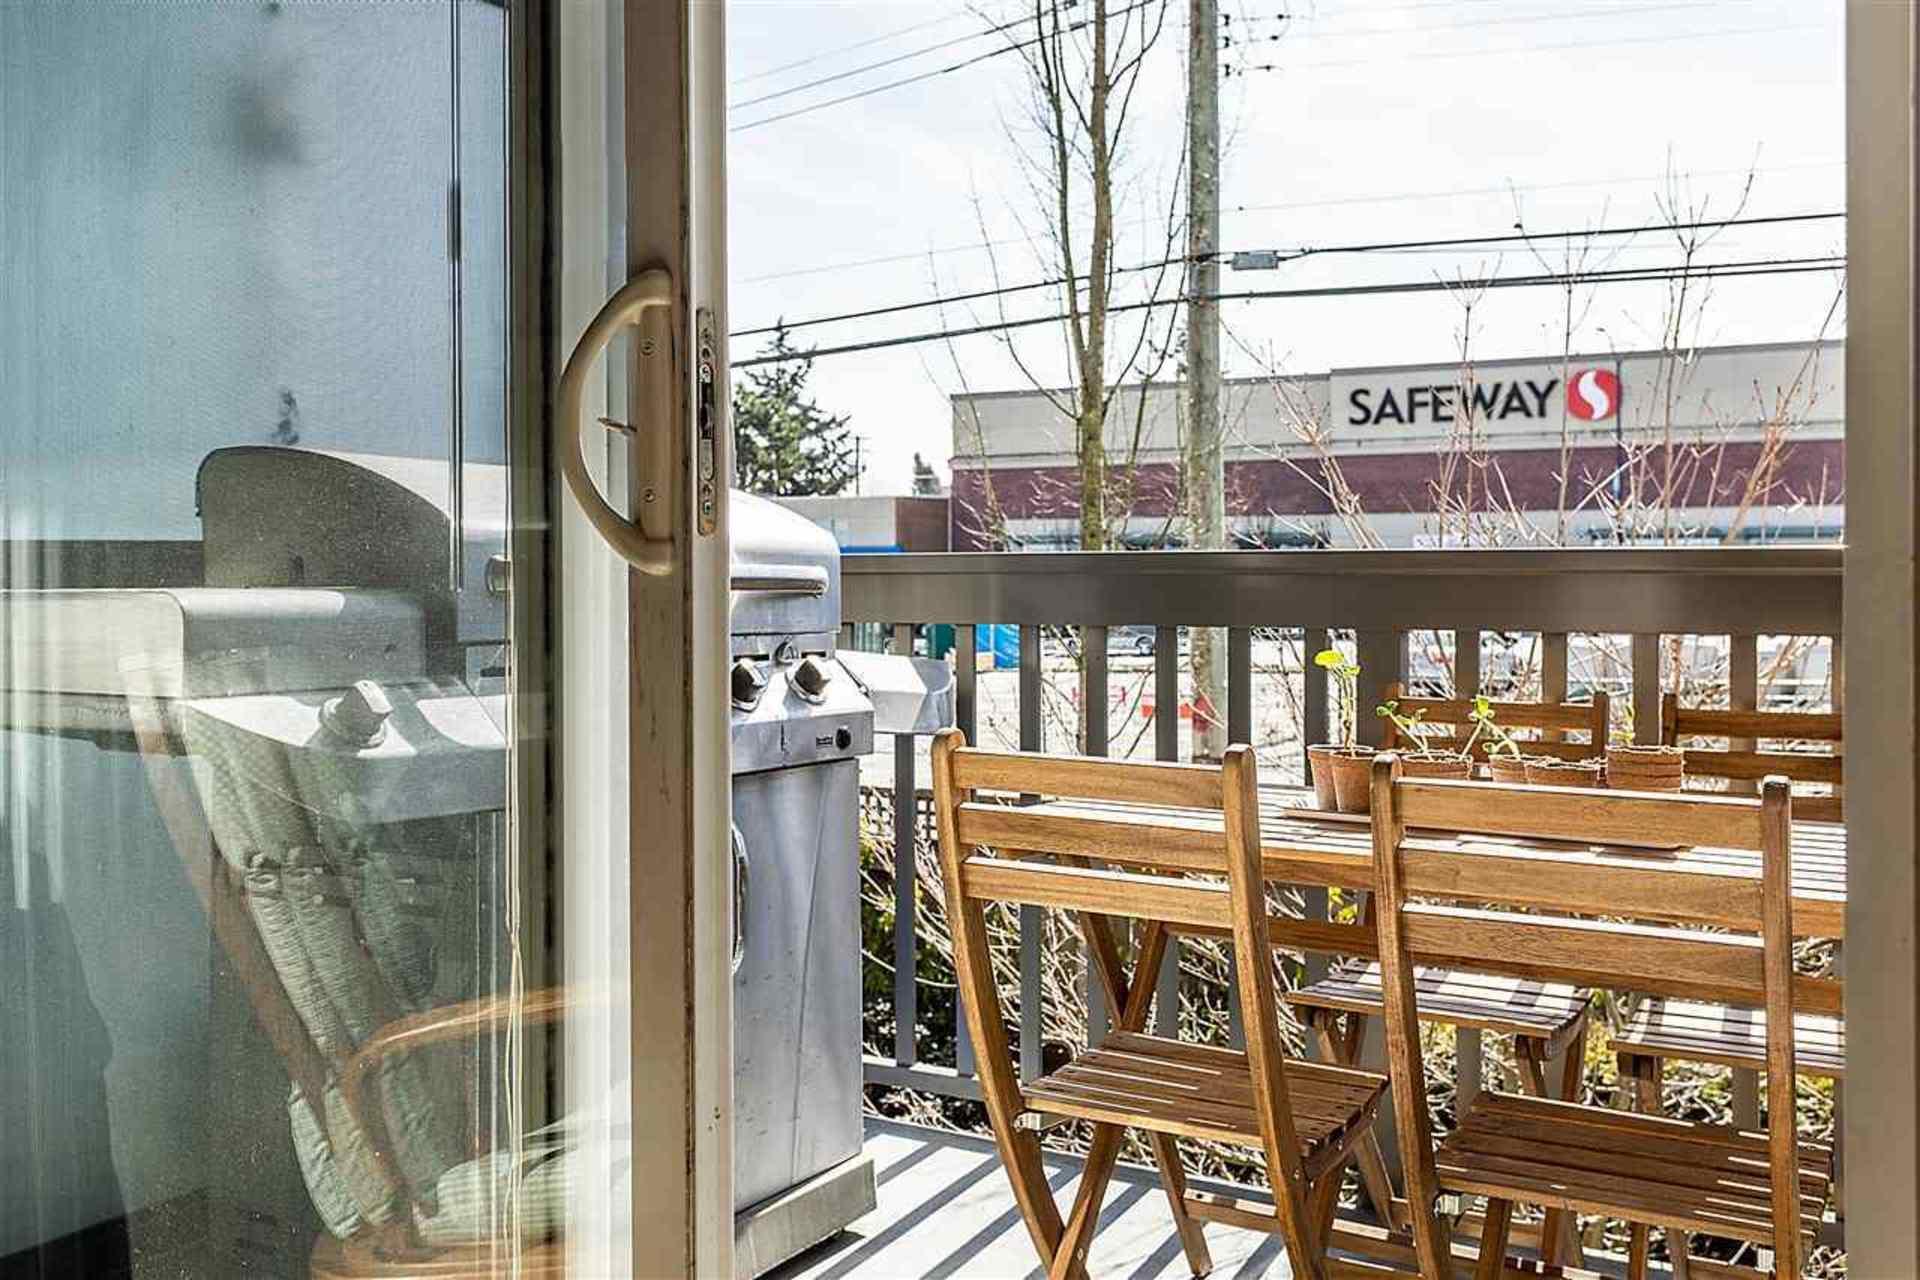 4438-albert-street-vancouver-heights-burnaby-north-13 at 110 - 4438 Albert Street, Vancouver Heights, Burnaby North